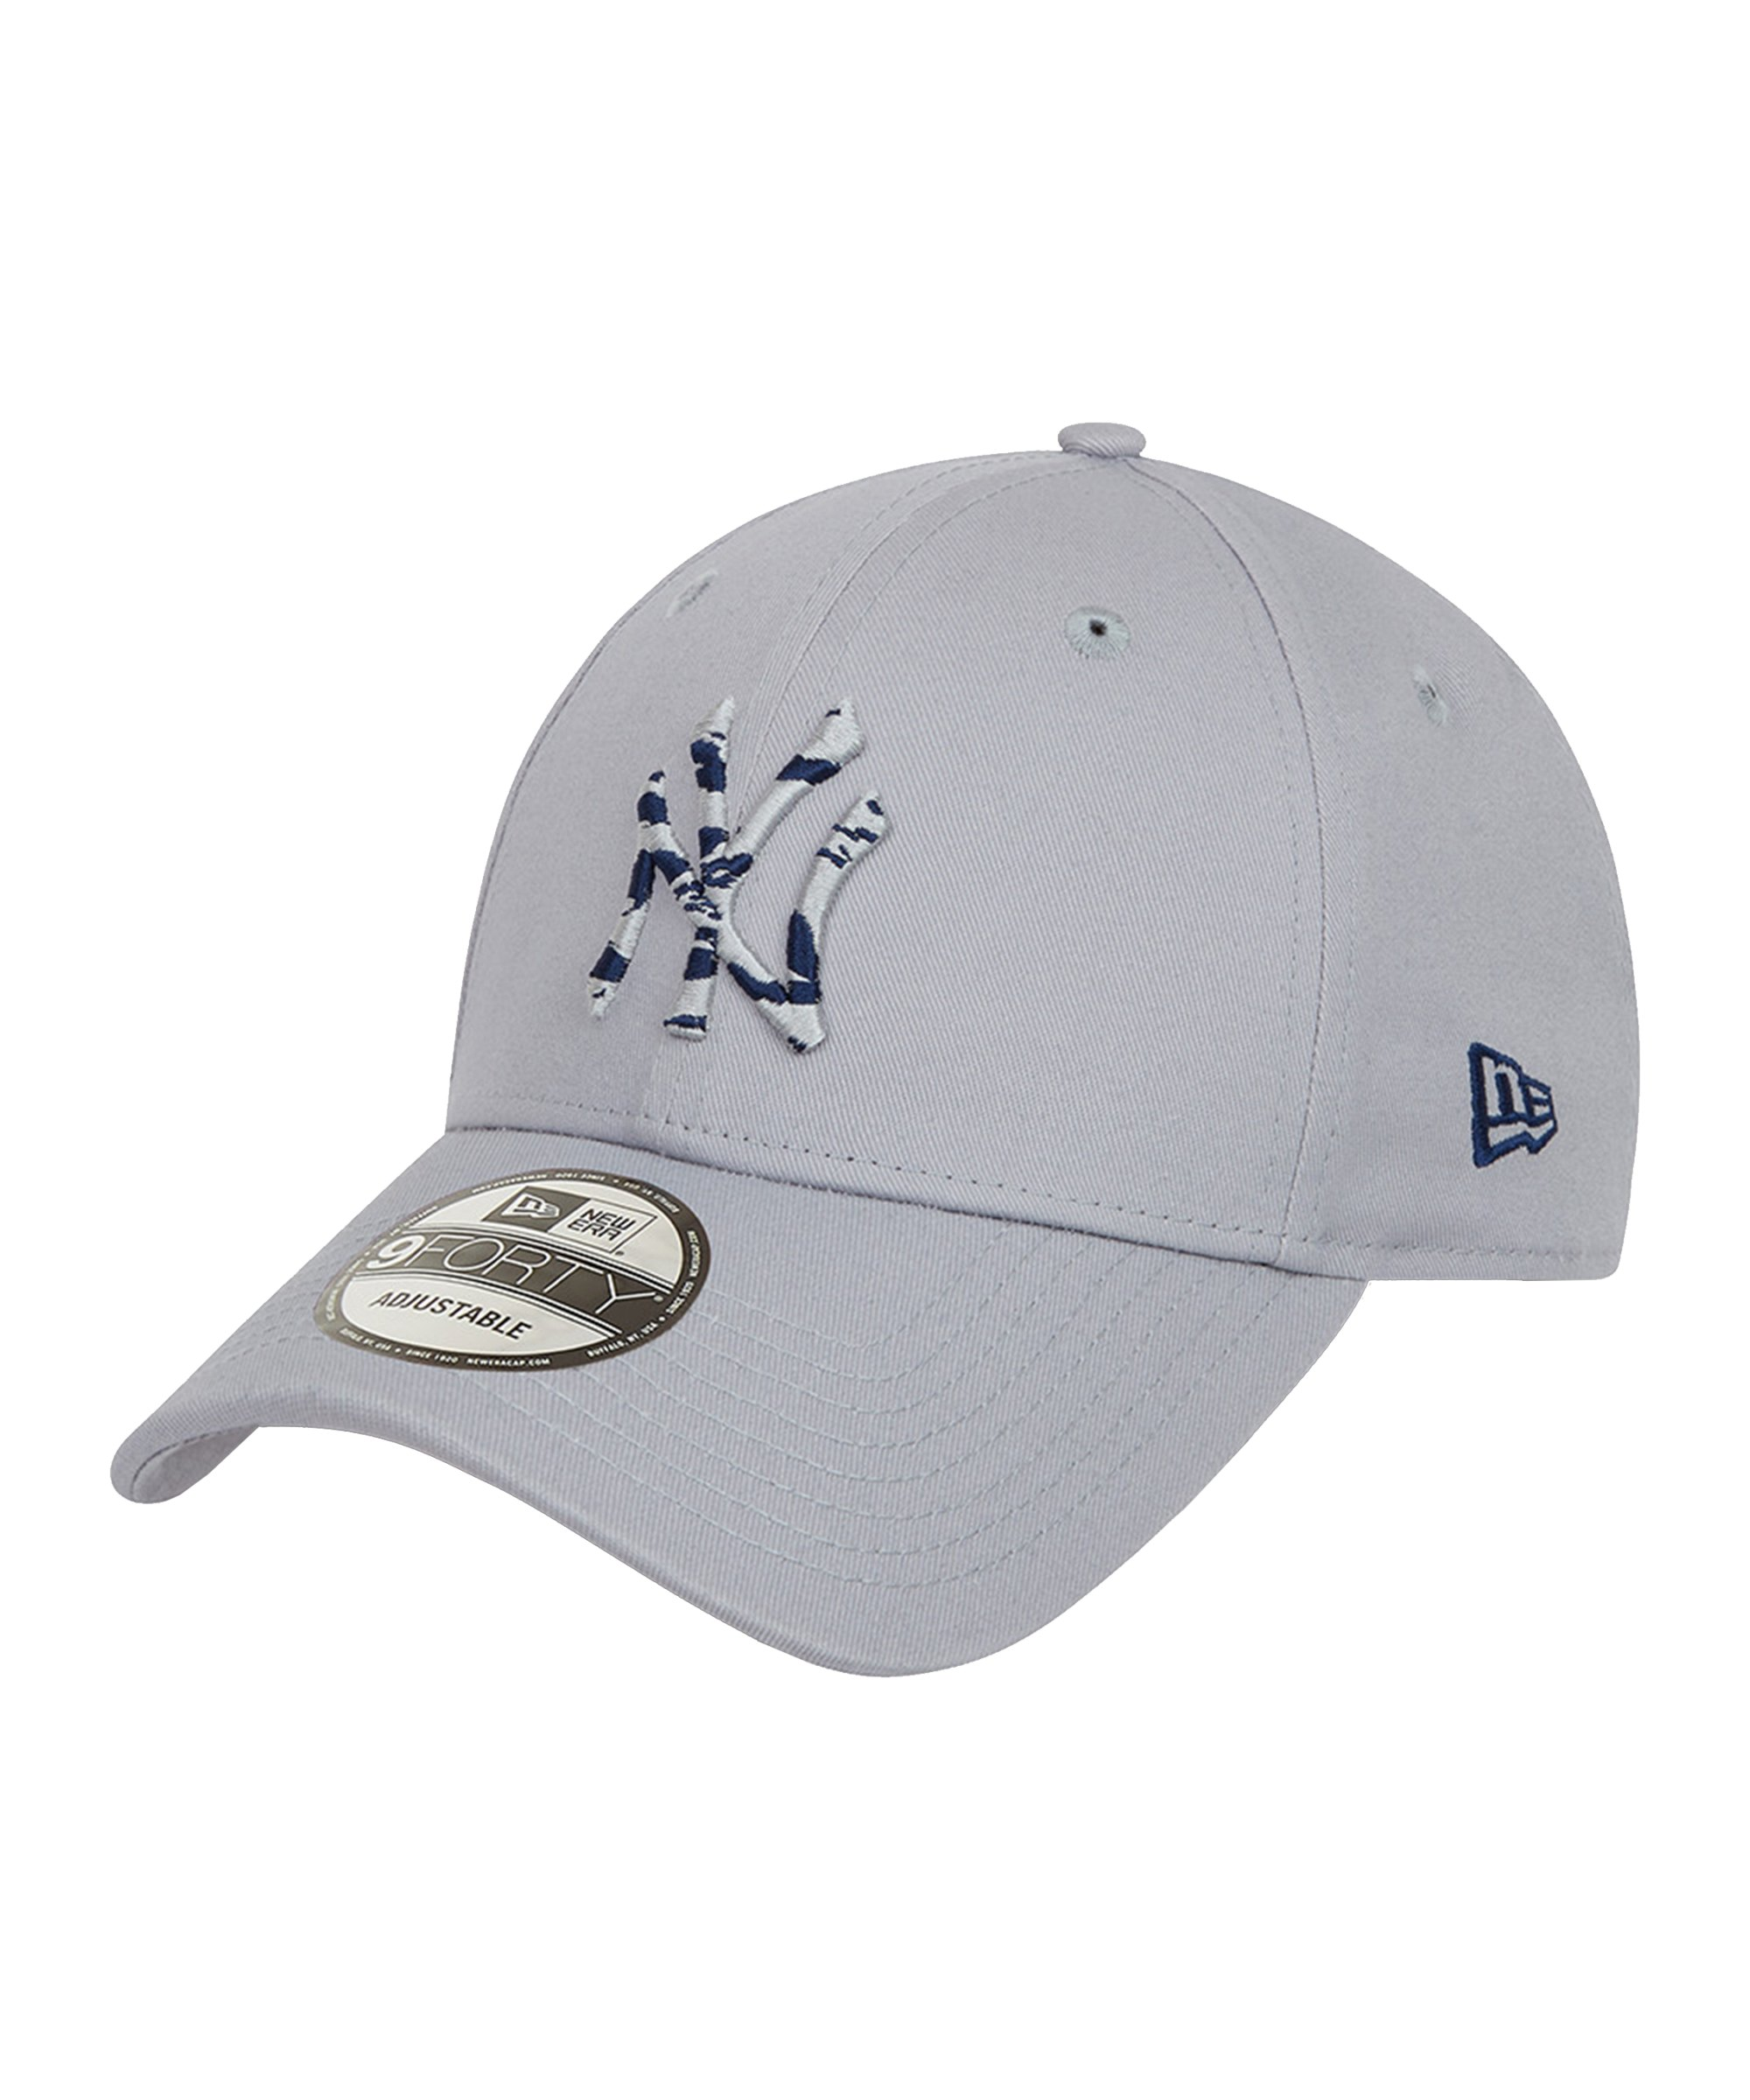 New Era NY Yankees Infill 9Forty Cap Grau FGRA - grau